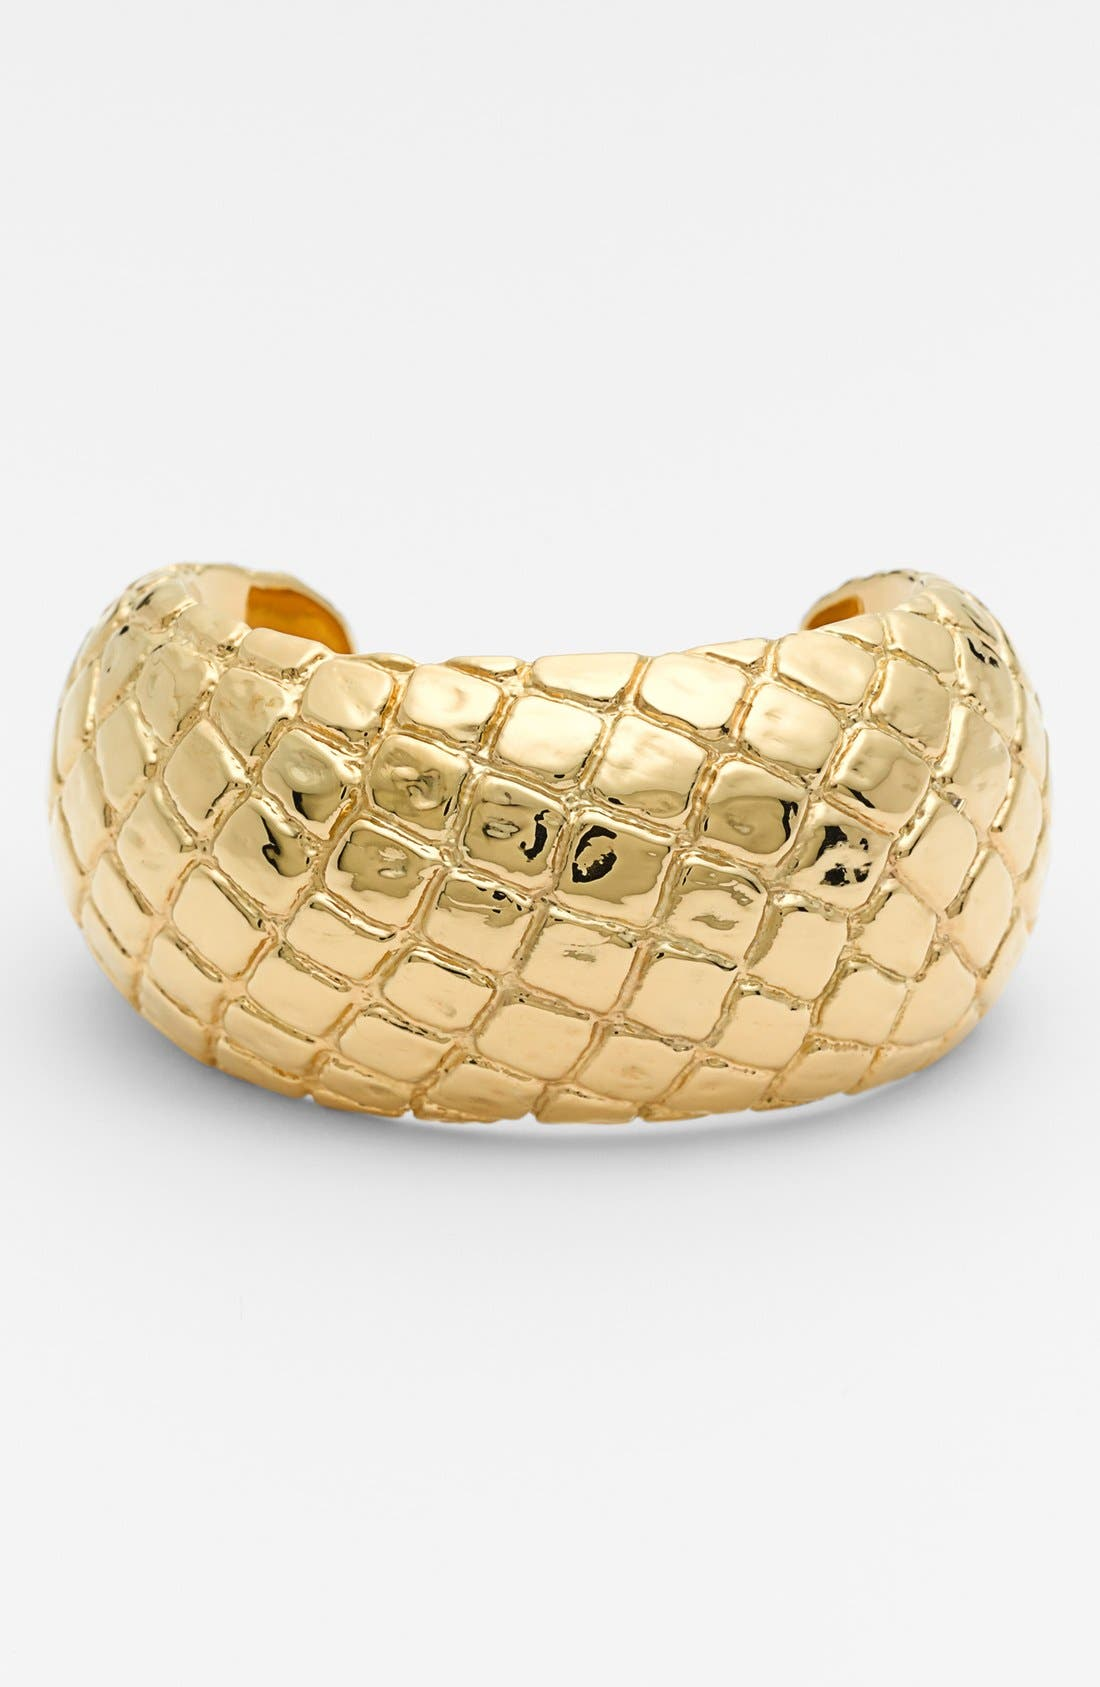 Main Image - Simon Sebbag 'Gold Crocodile' Cuff